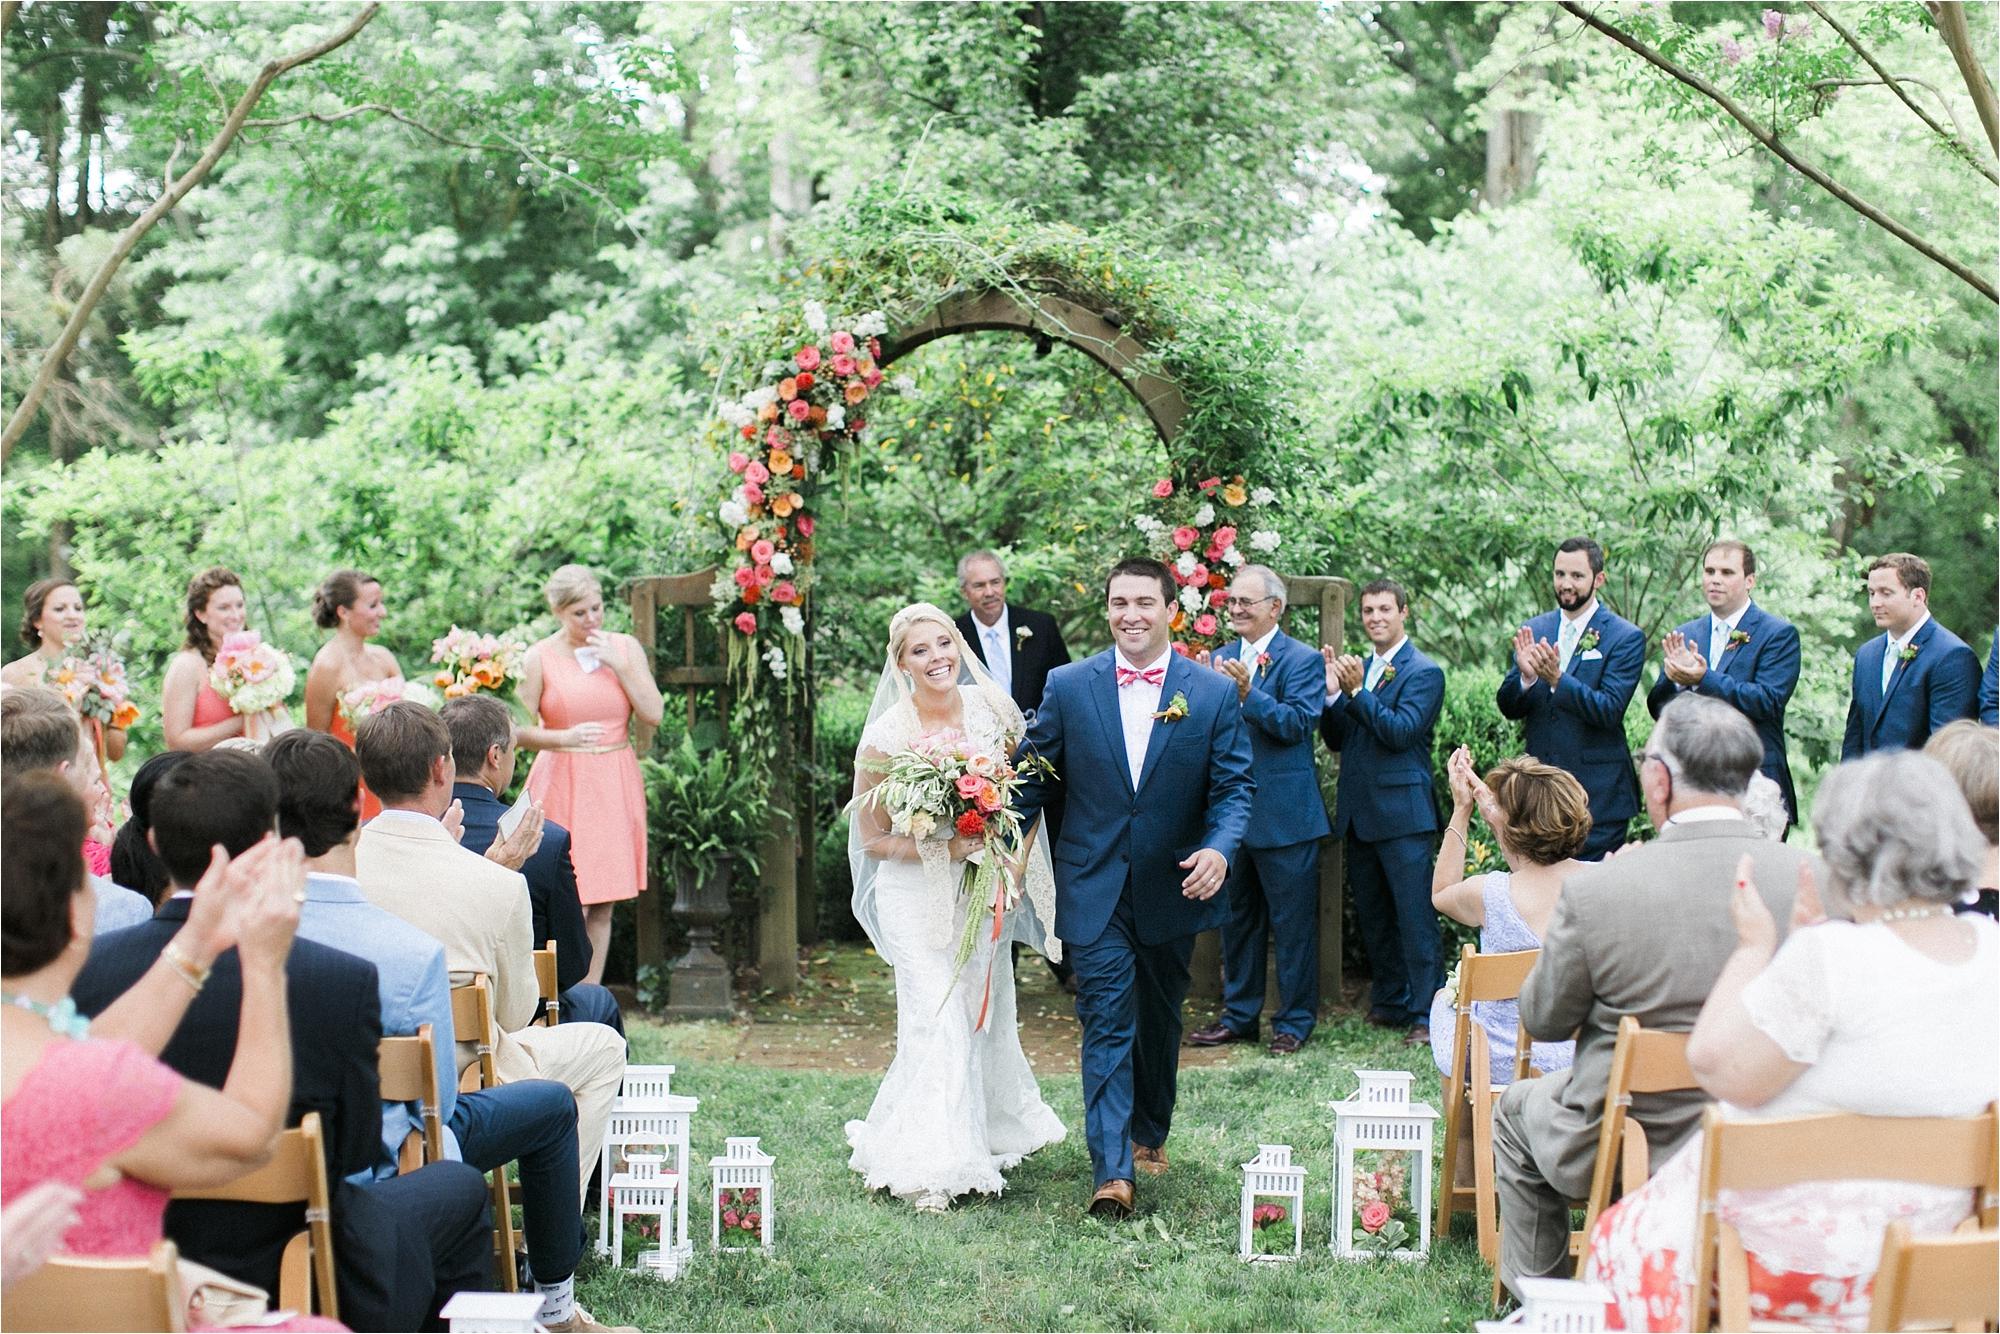 richmond-virginia-tuckahoe-plantation-coral-summer-wedding-stephanie-yonce-photos_0033.jpg